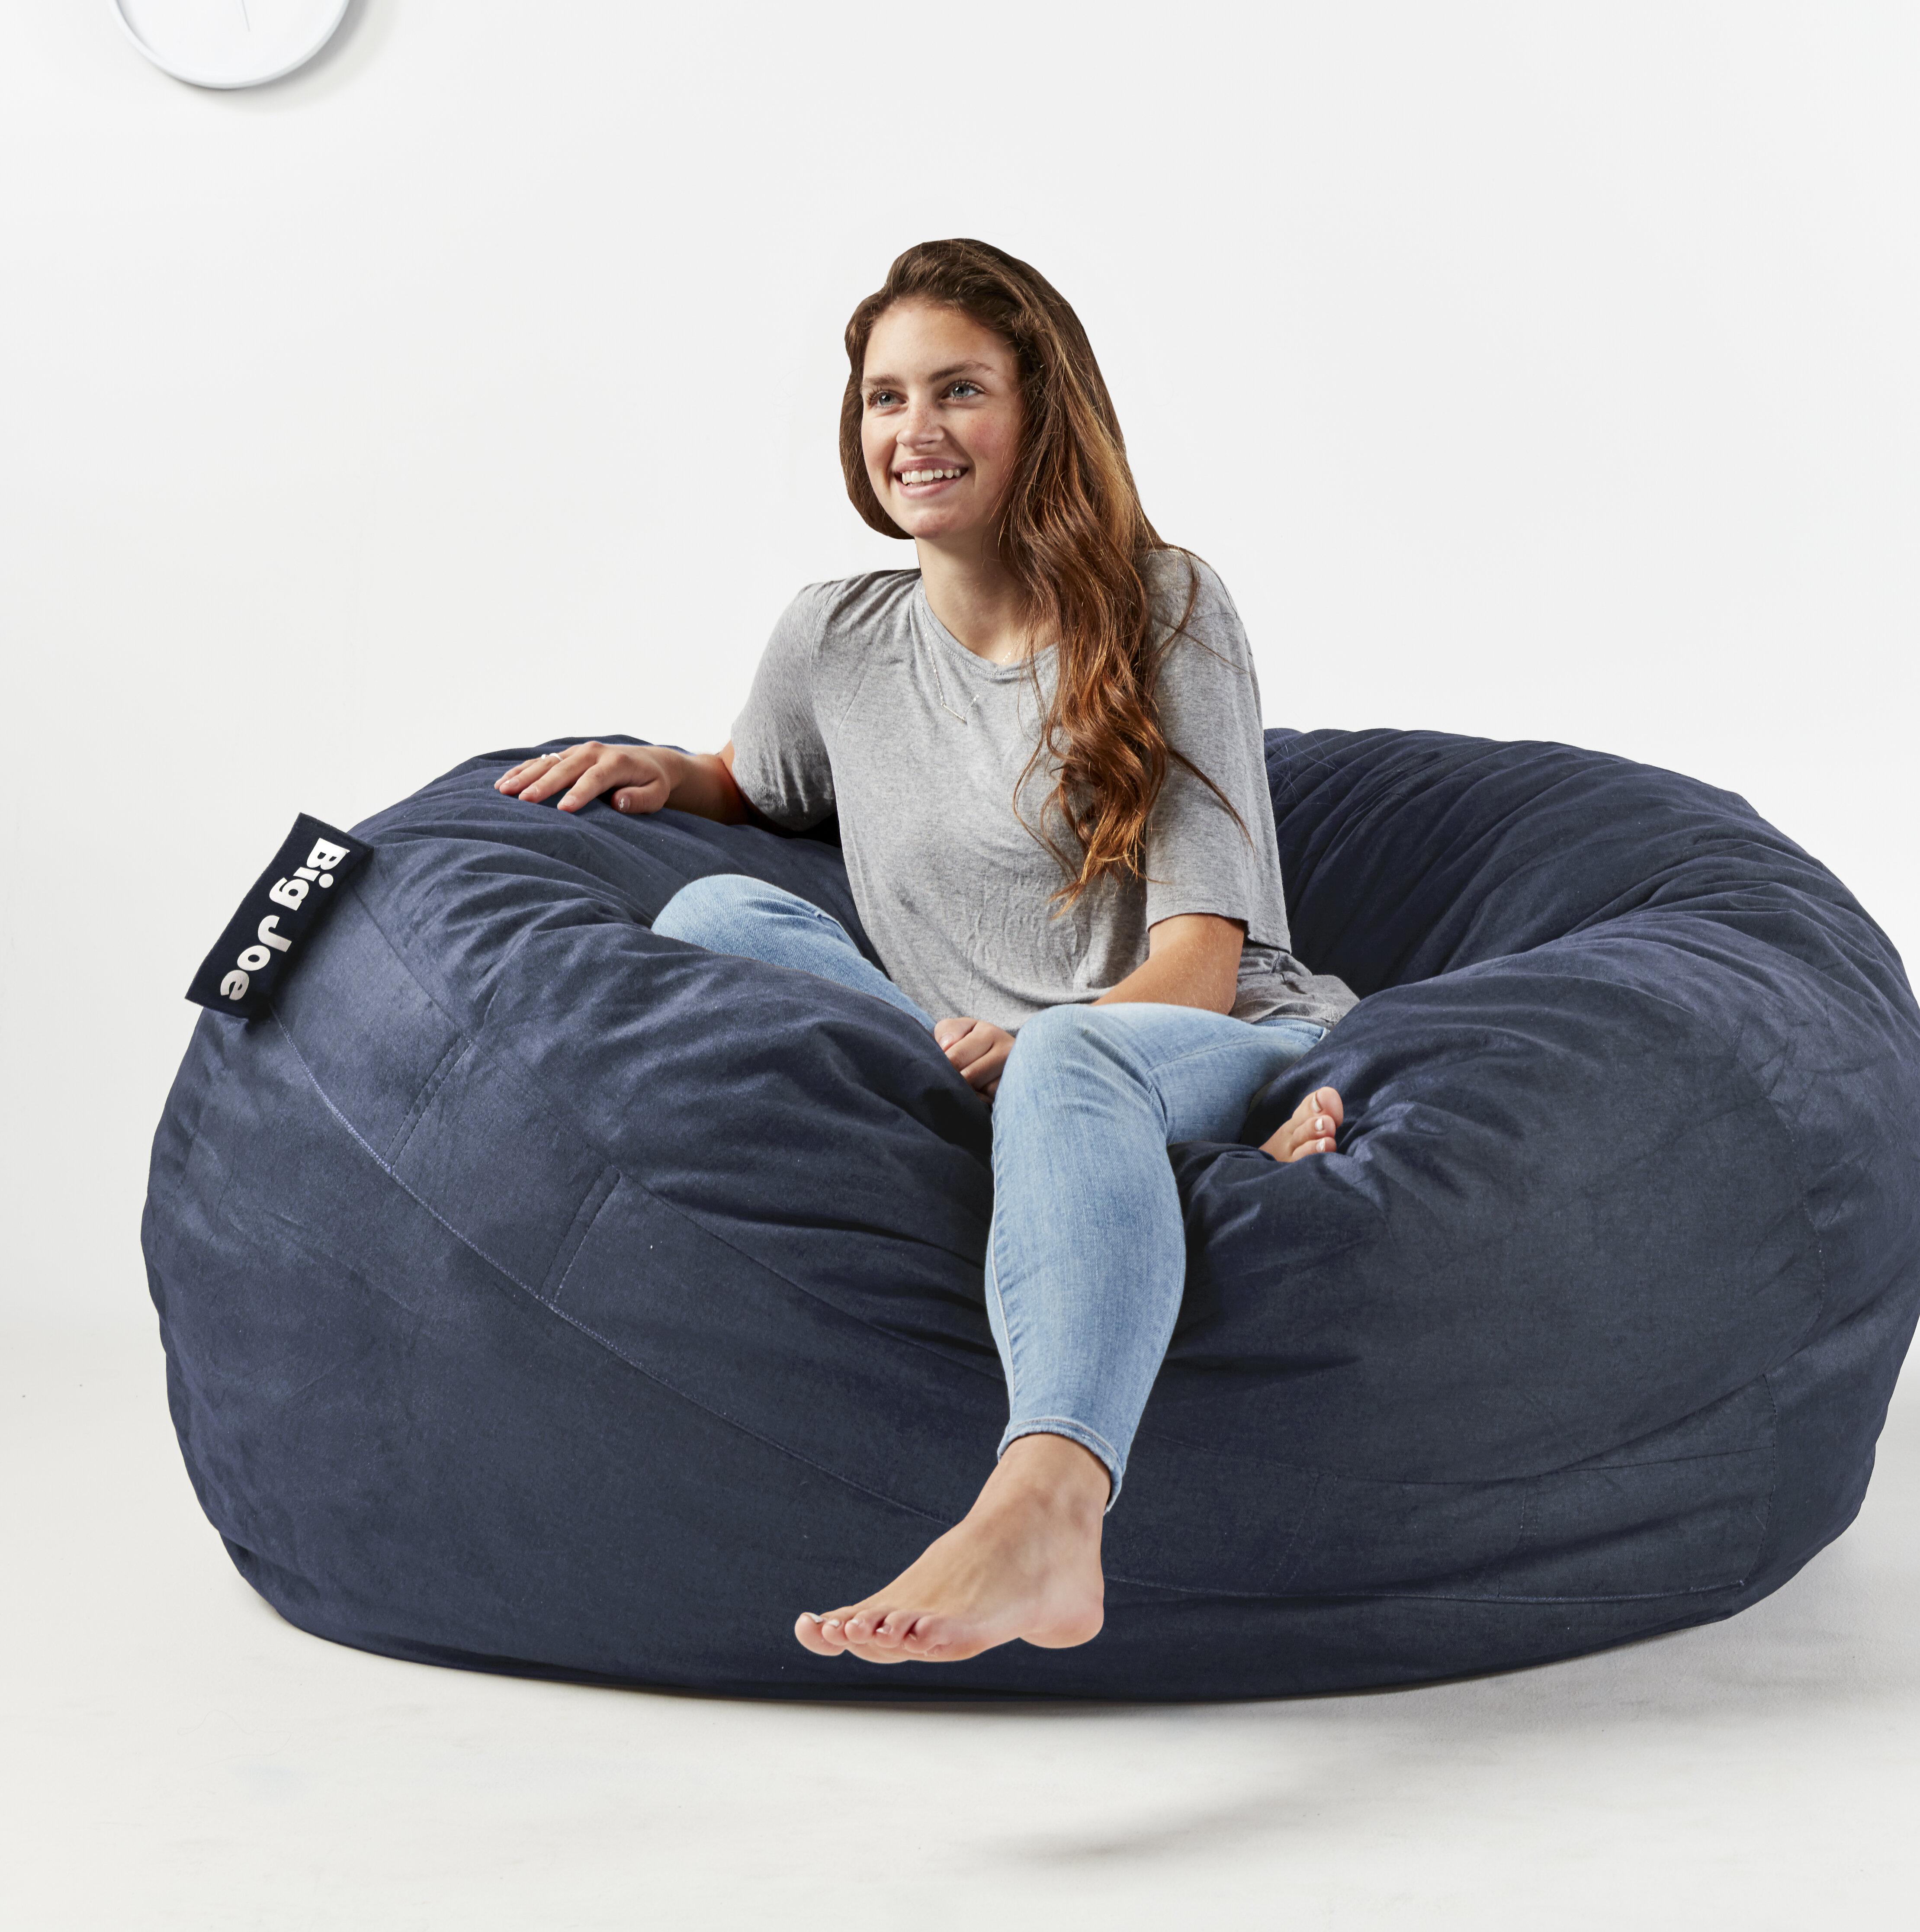 Pleasant Fuf Big Joe King Bean Bag Chair Ibusinesslaw Wood Chair Design Ideas Ibusinesslaworg